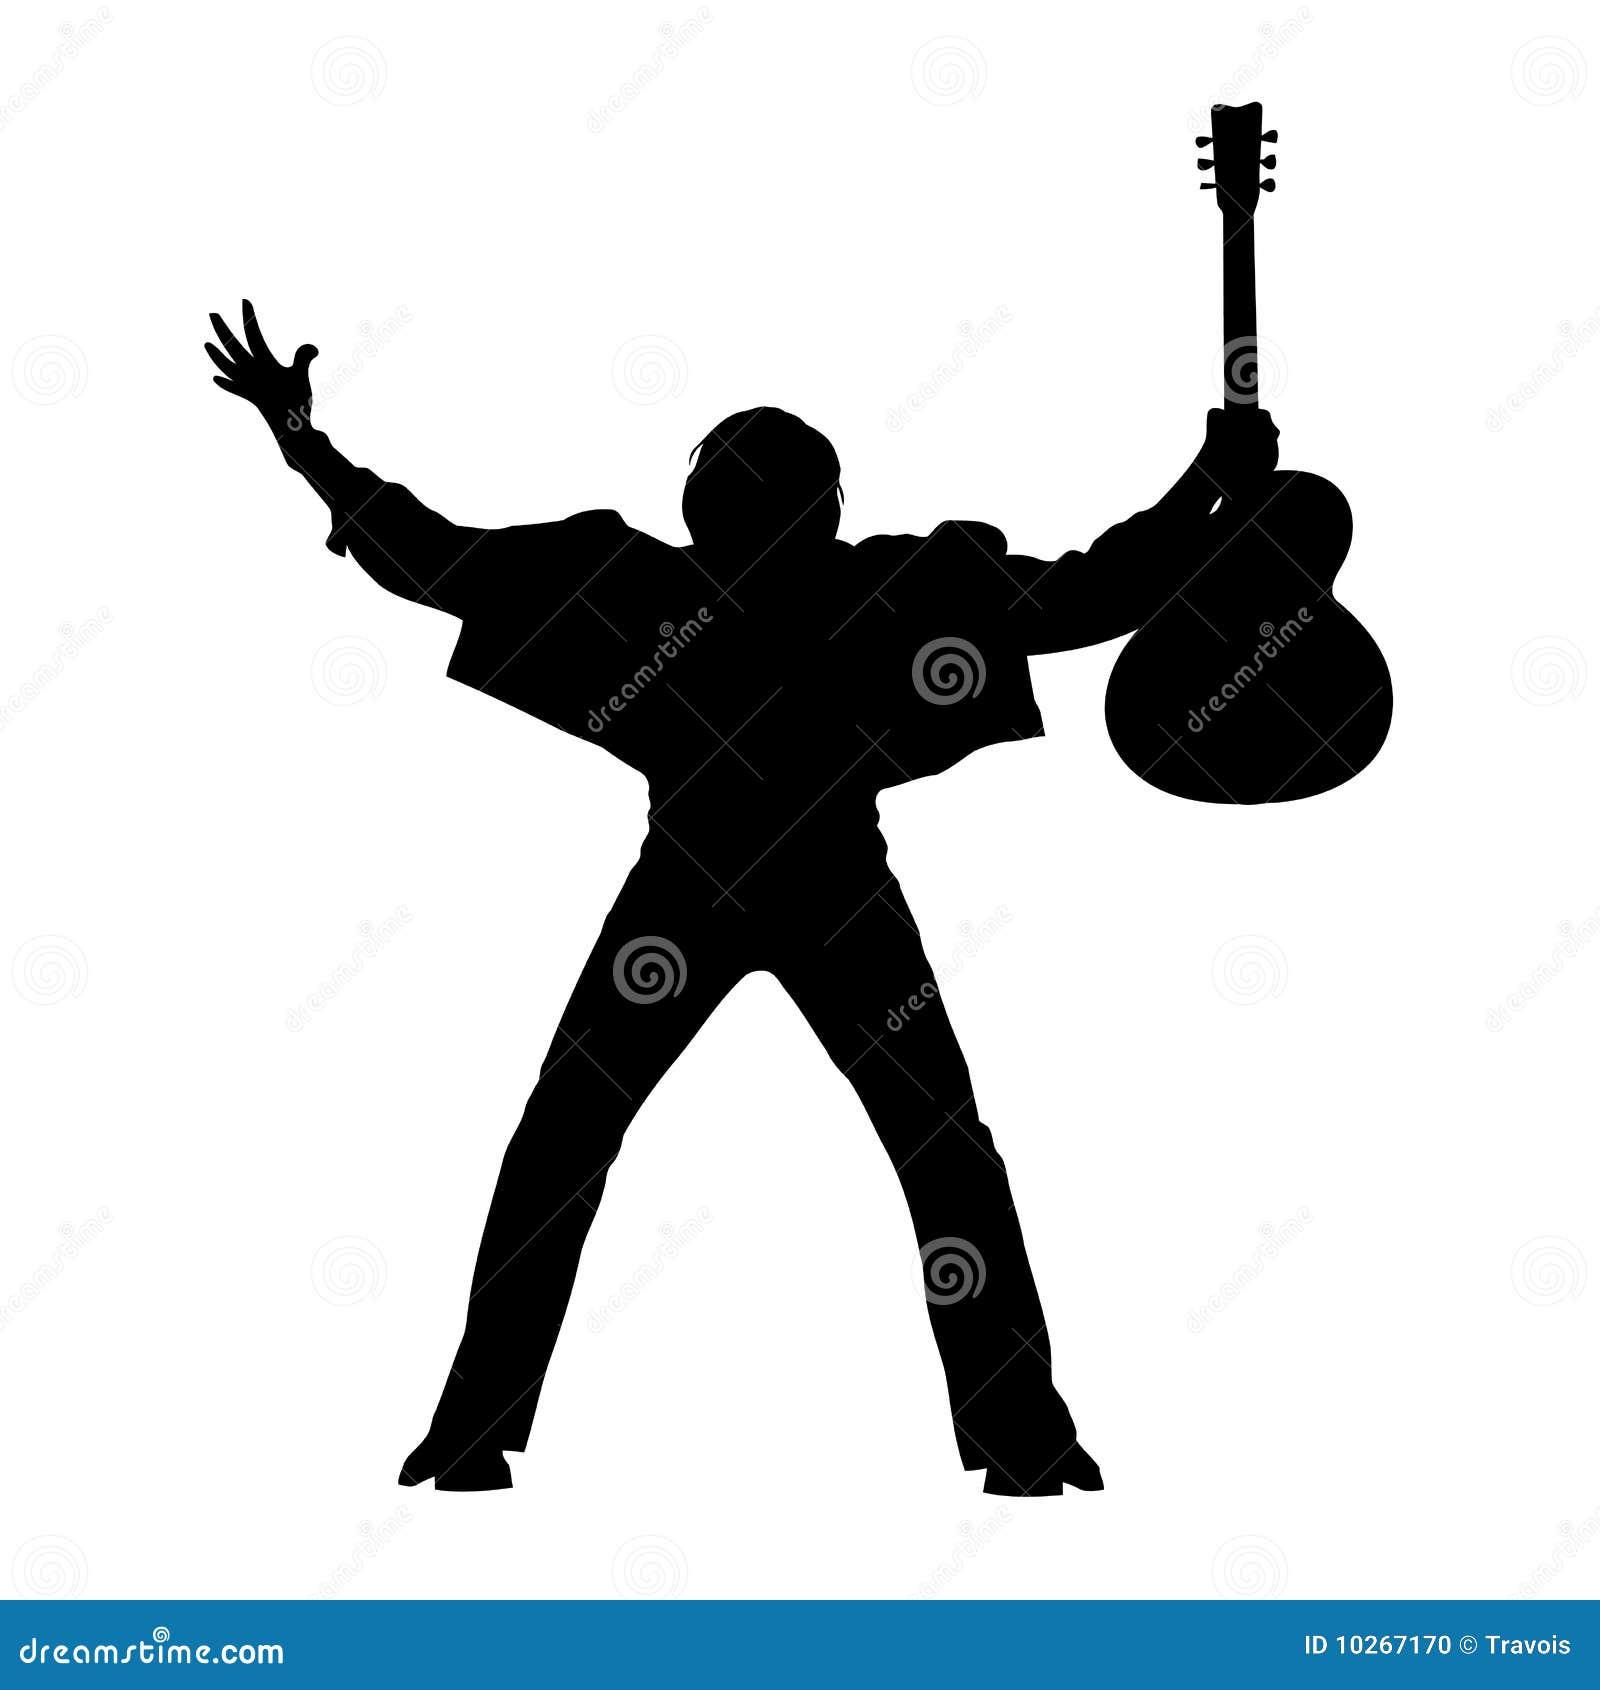 Guitarist silhouette stock illustration. Image of ...